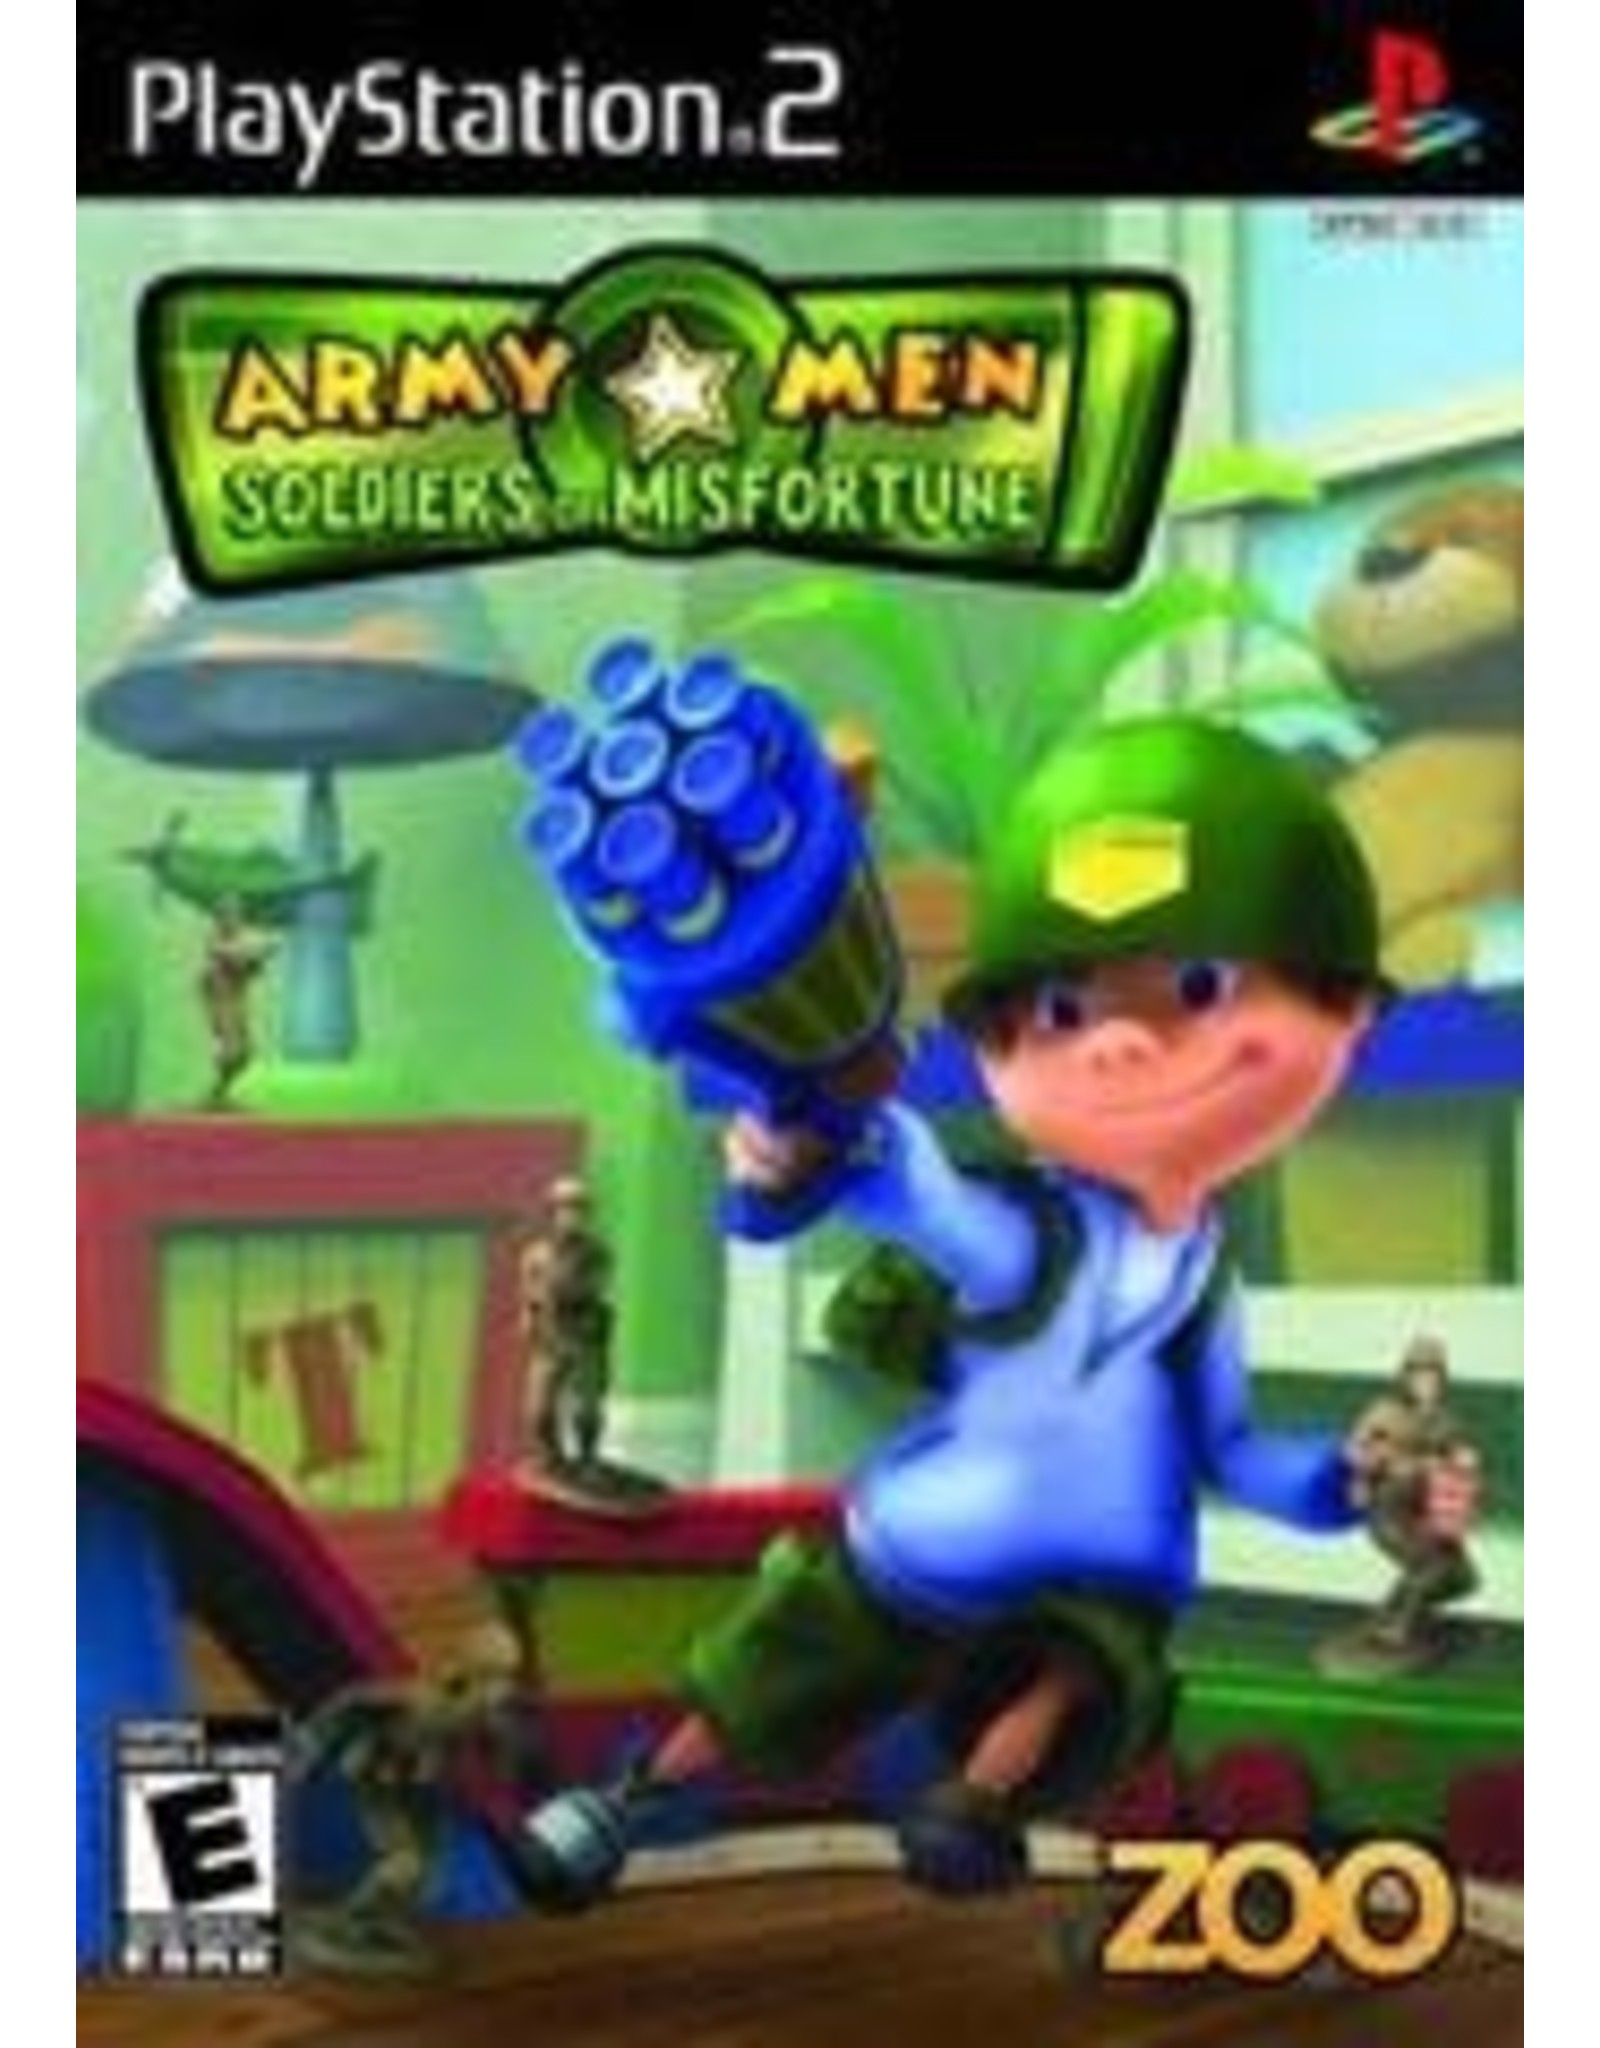 Playstation 2 Army Men Soldiers of Misfortune (CiB)